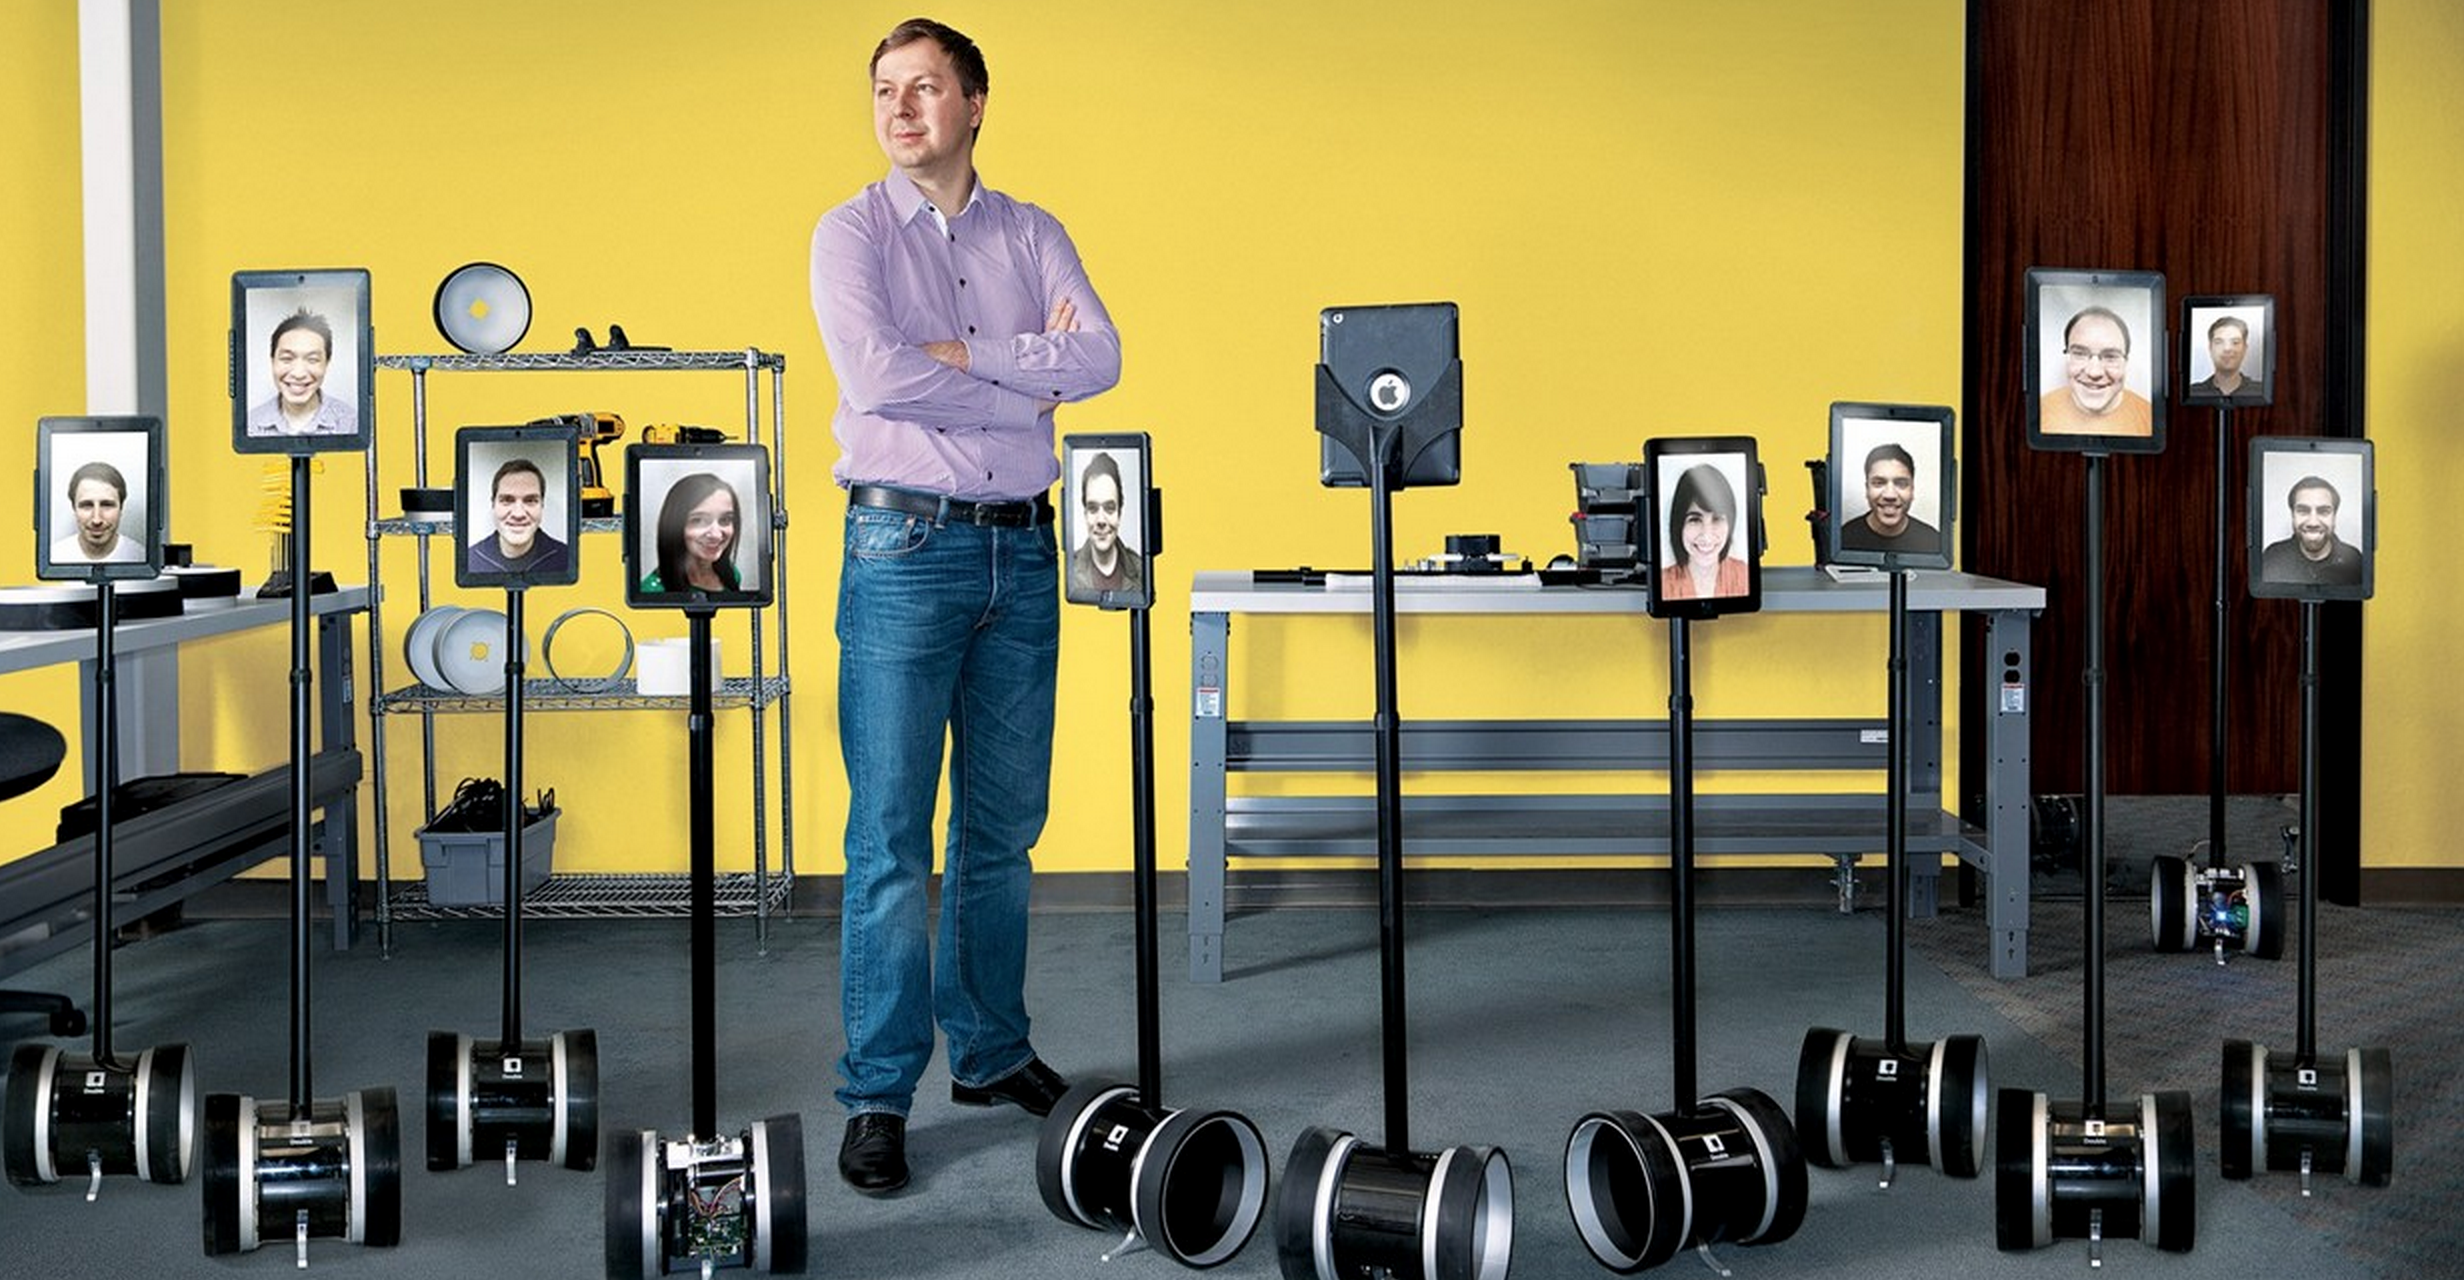 robot telepresence beam